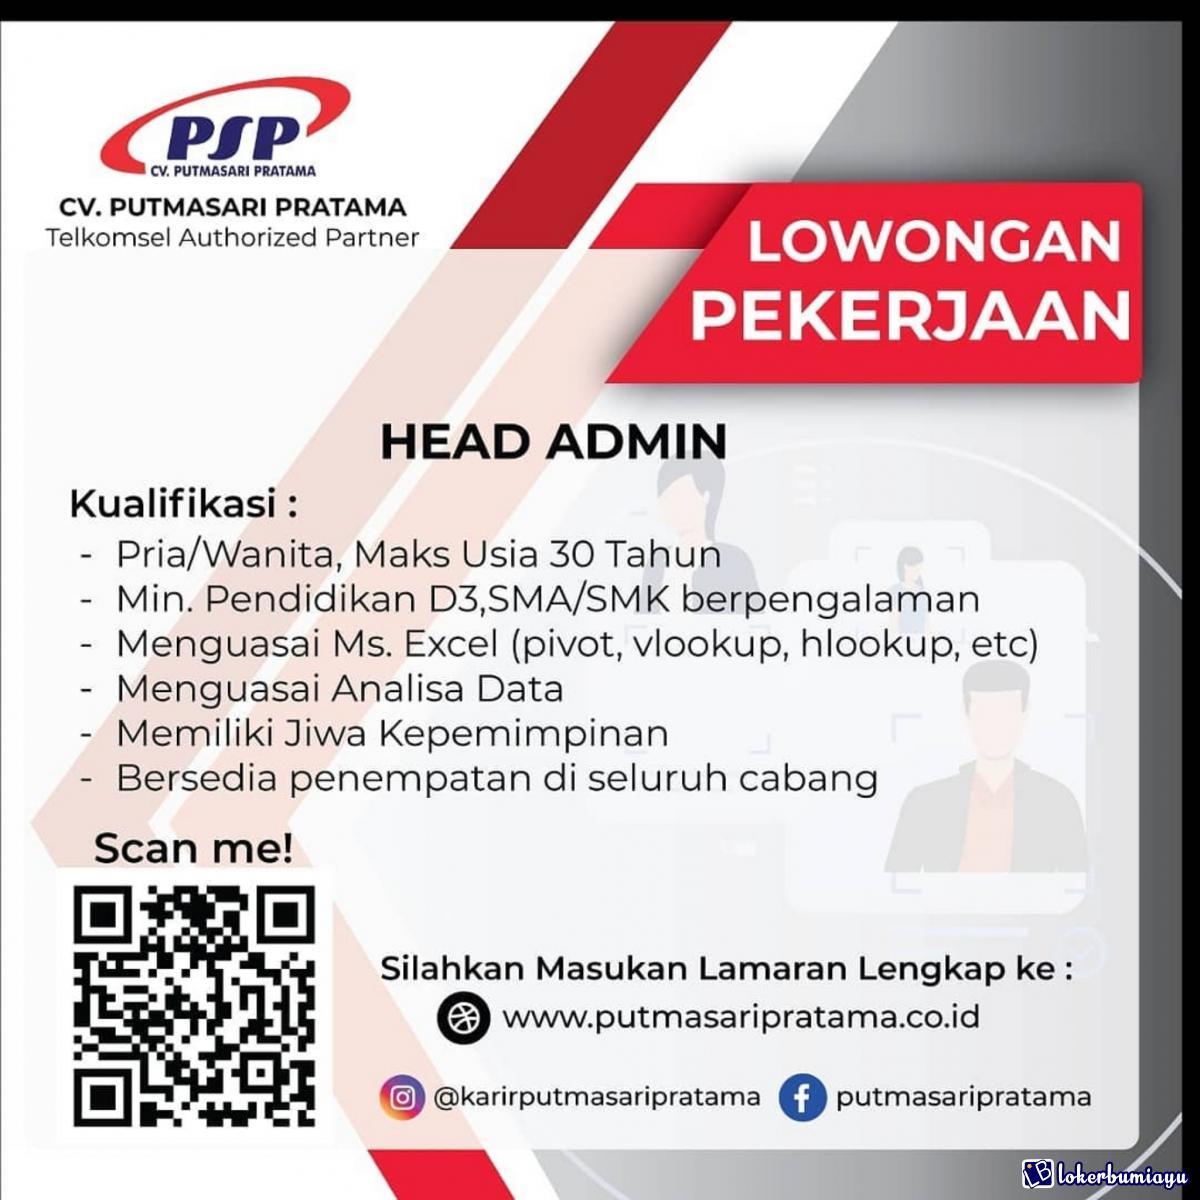 CV Putmasari Pratama